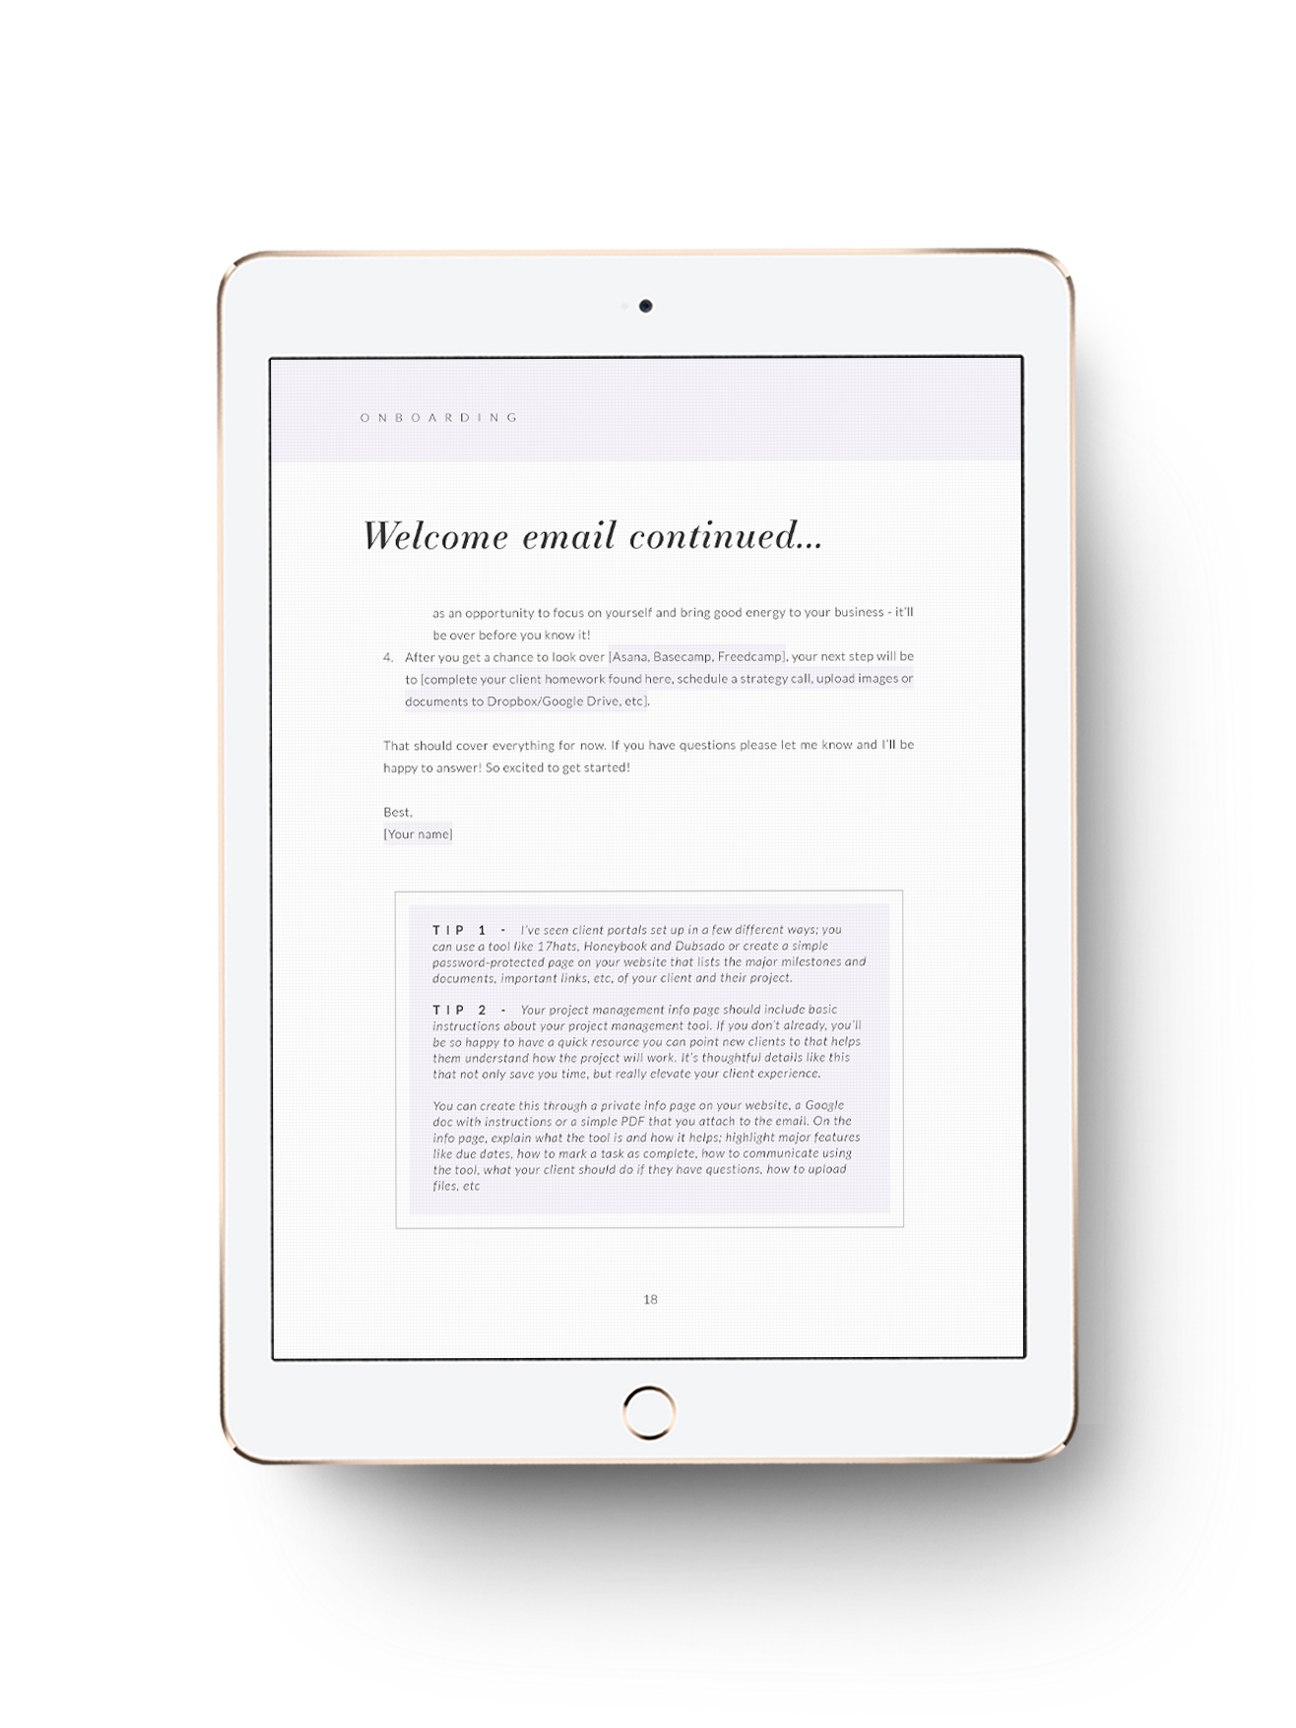 ipad_client communication 4.png